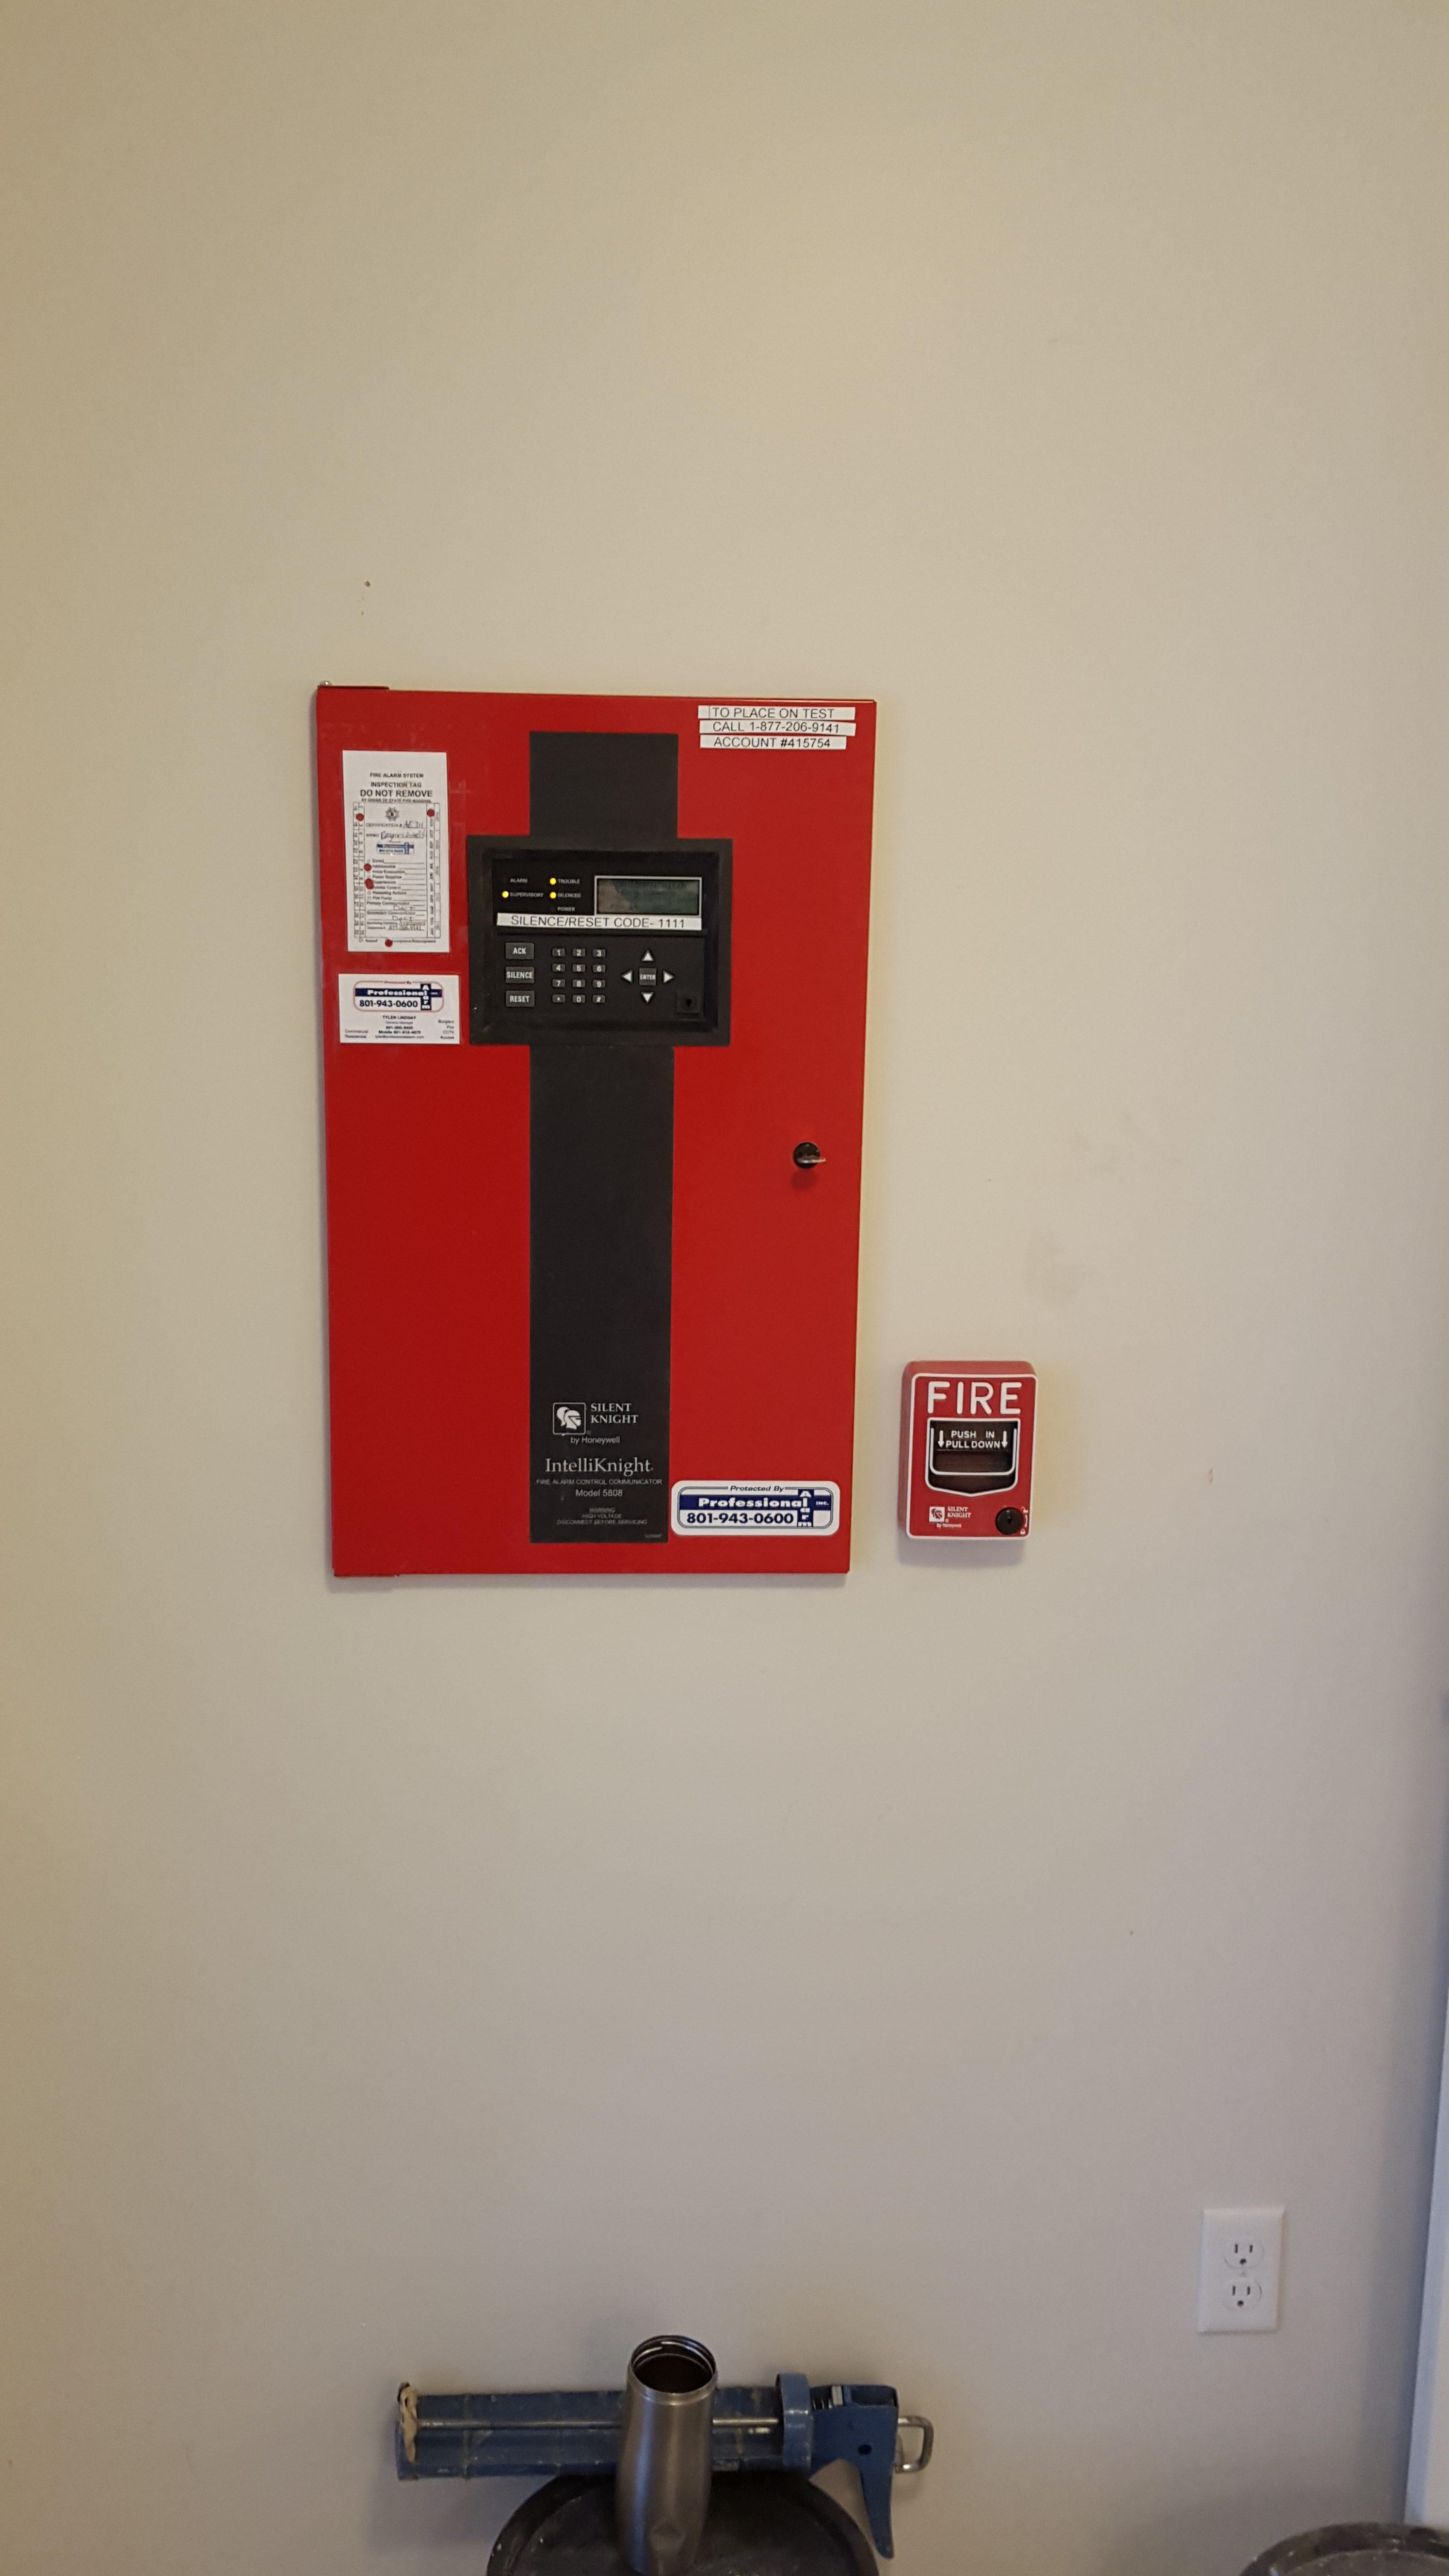 Fire-Alarm-e1470353093427